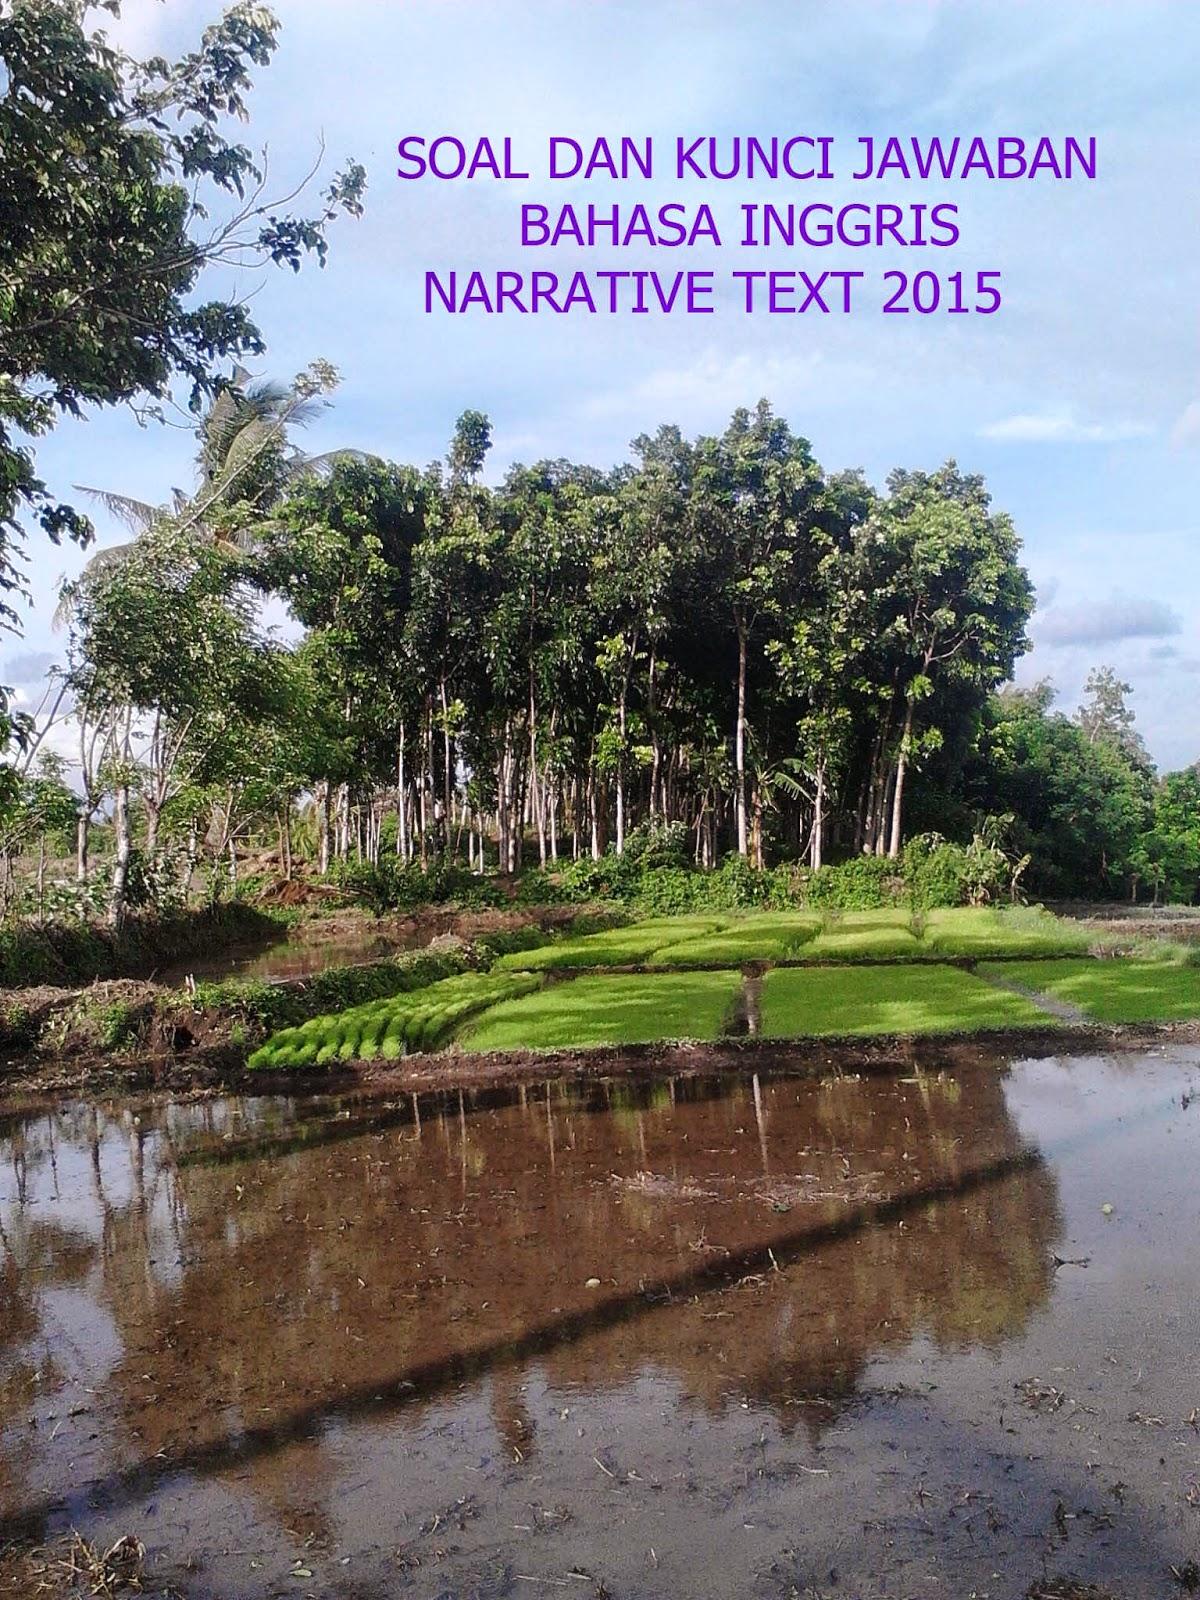 Soal Bahasa Inggris Narrative Text Dan Kunci Jawaban 2015 Kumpulan